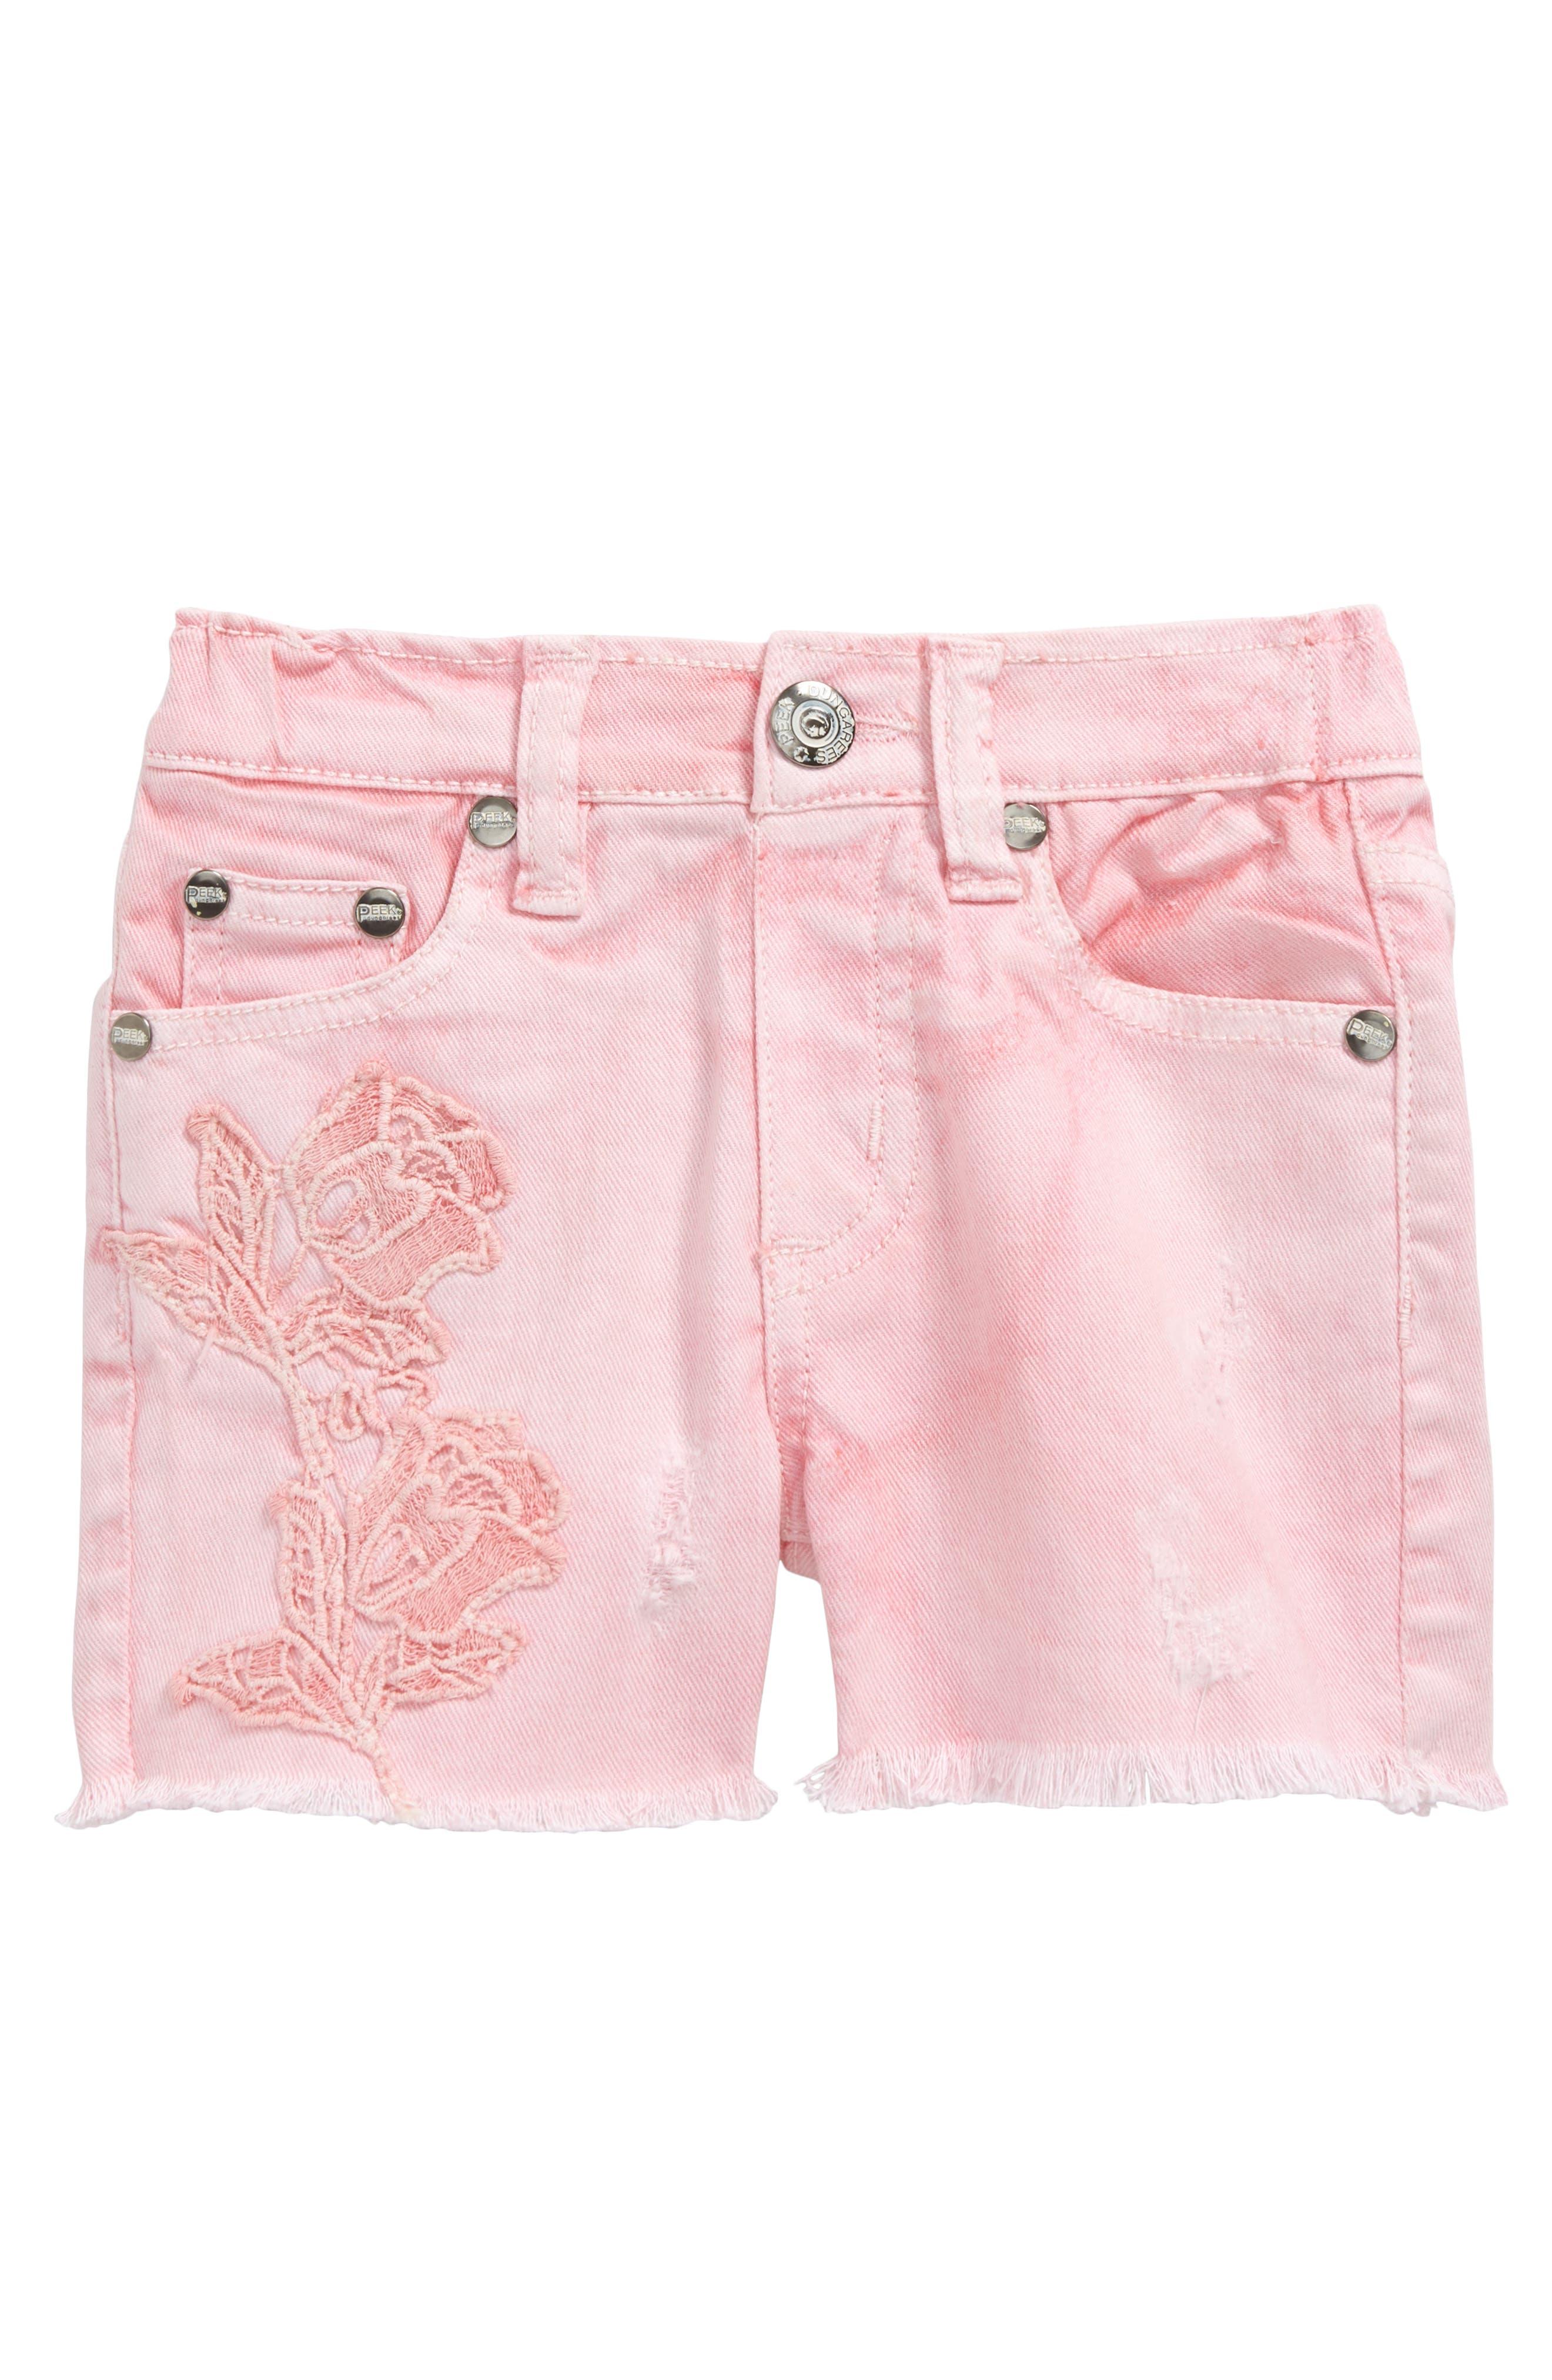 Griffin Cutoff Denim Shorts,                         Main,                         color, Pink